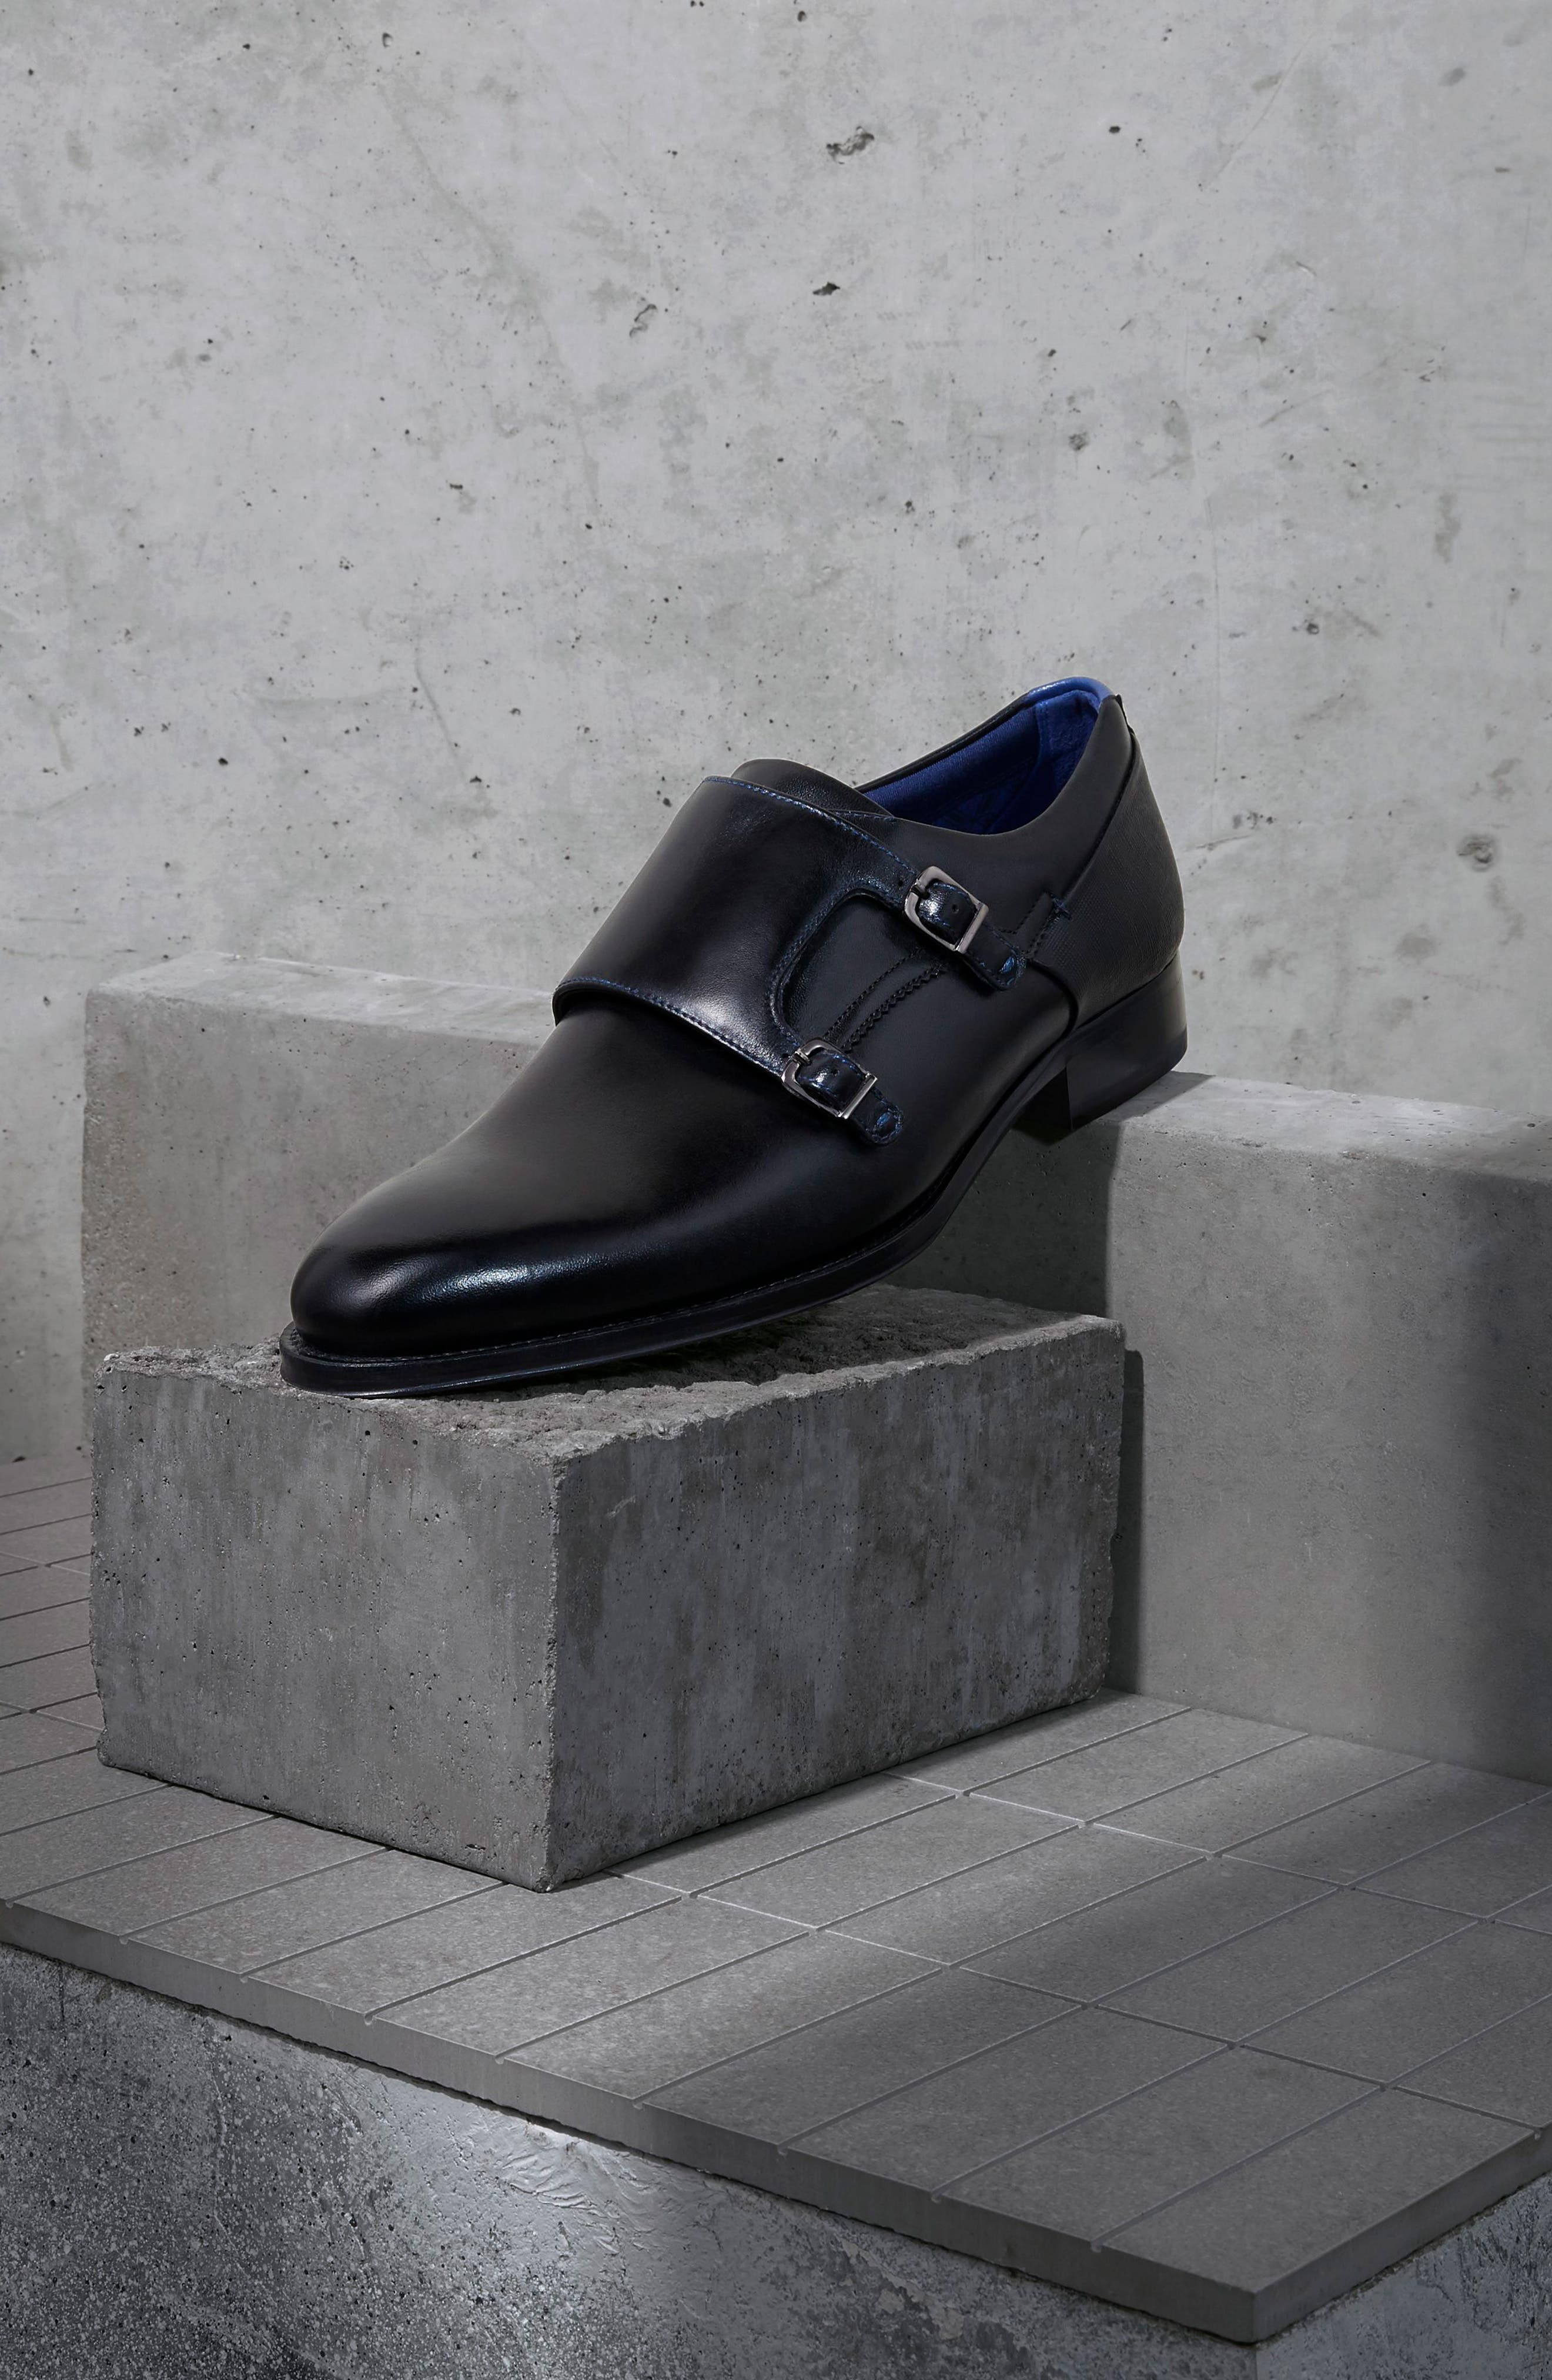 TED BAKER LONDON, Cathon Double Buckle Monk Shoe, Alternate thumbnail 7, color, BLACK LEATHER